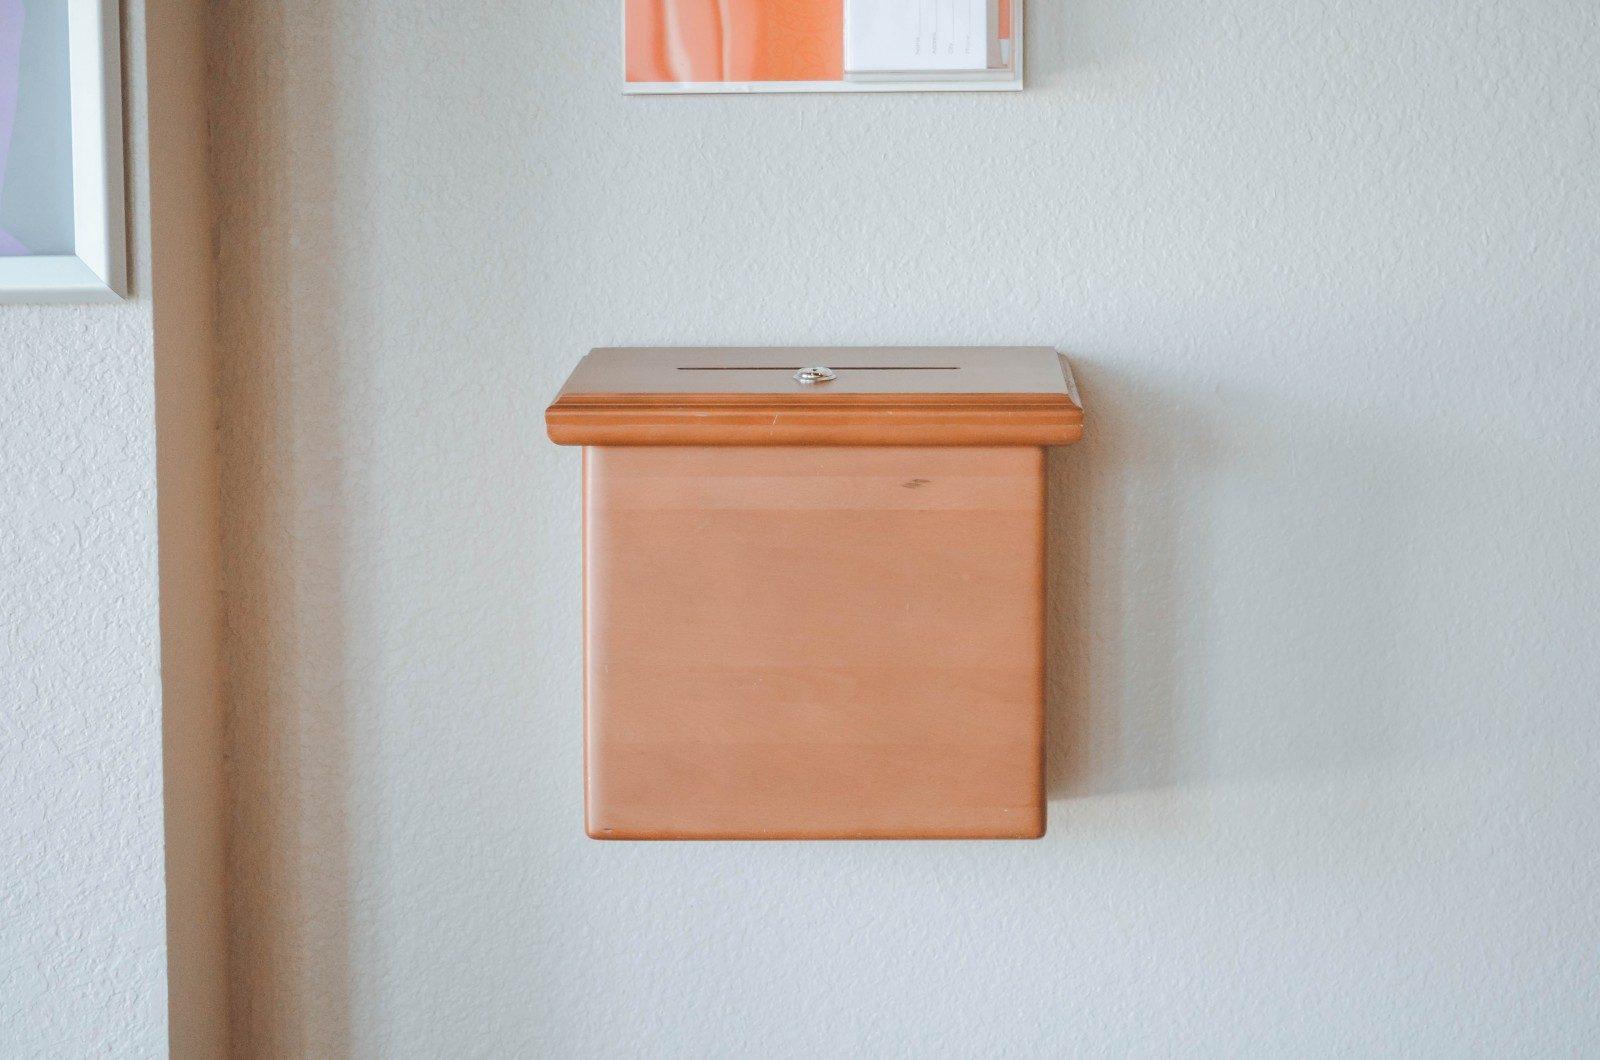 brown mail box